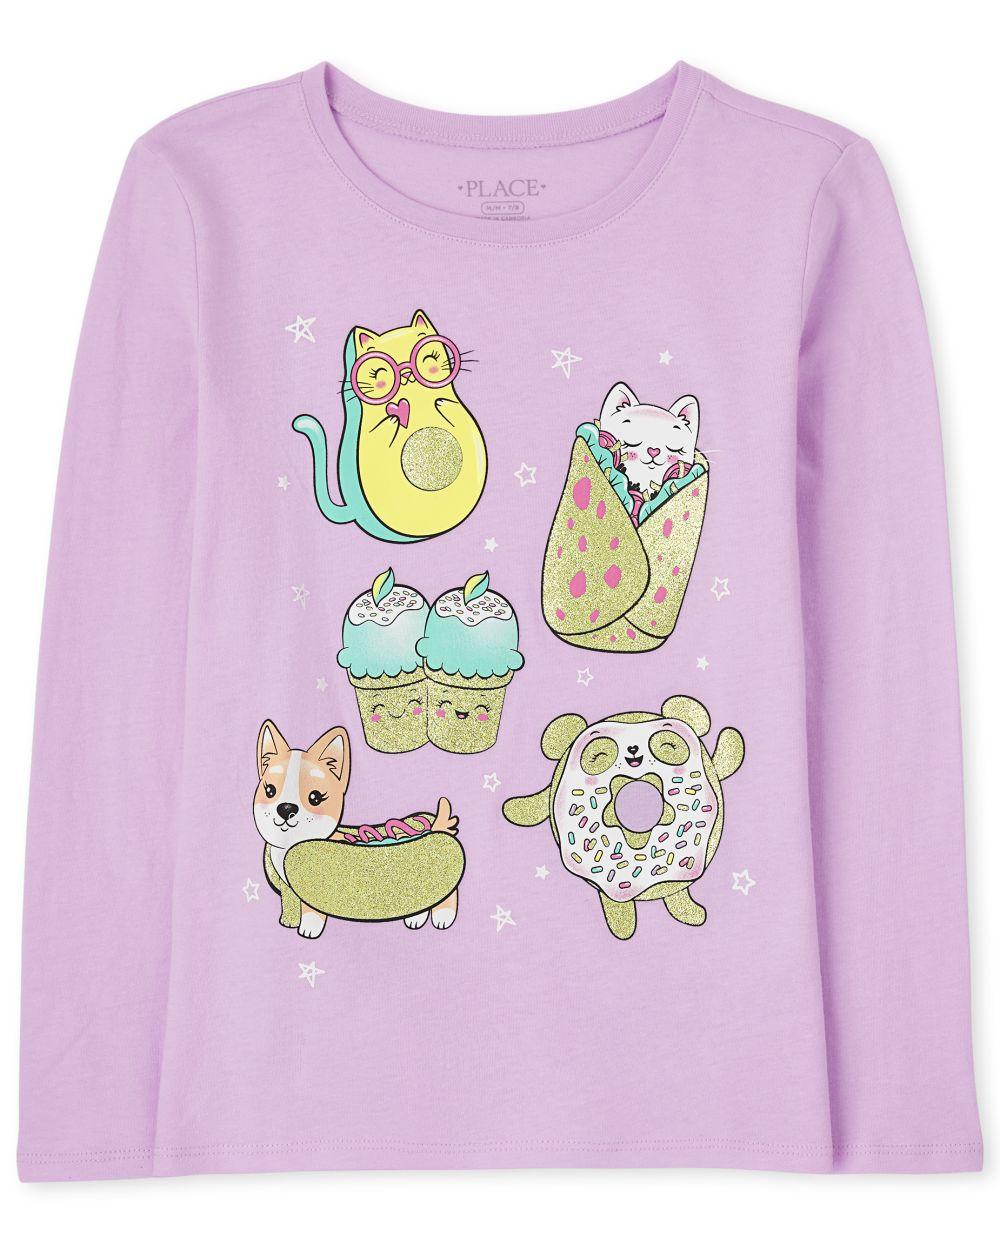 Food Squishies Graphic Tee - Purple T-Shirt